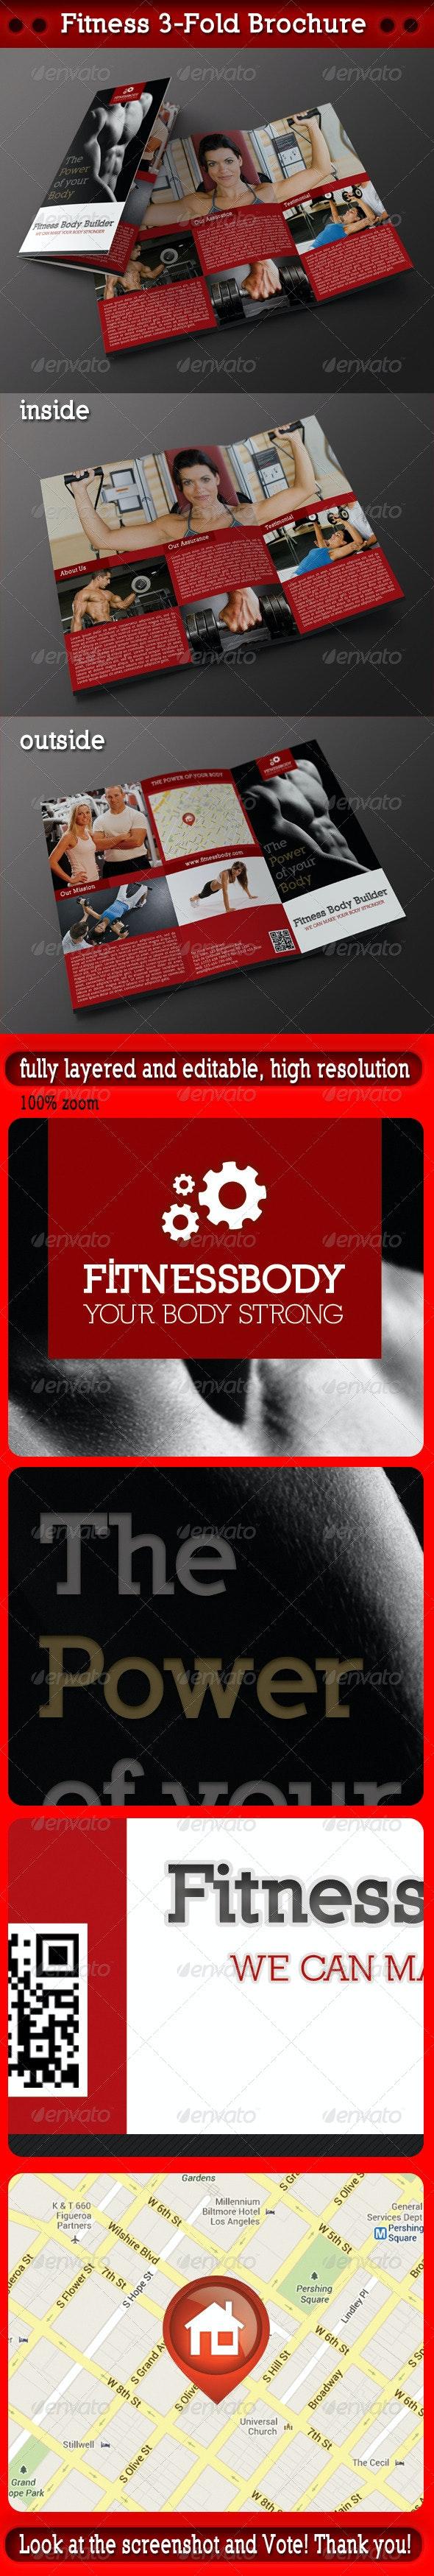 Fitness 3-Fold Brochure - Corporate Brochures